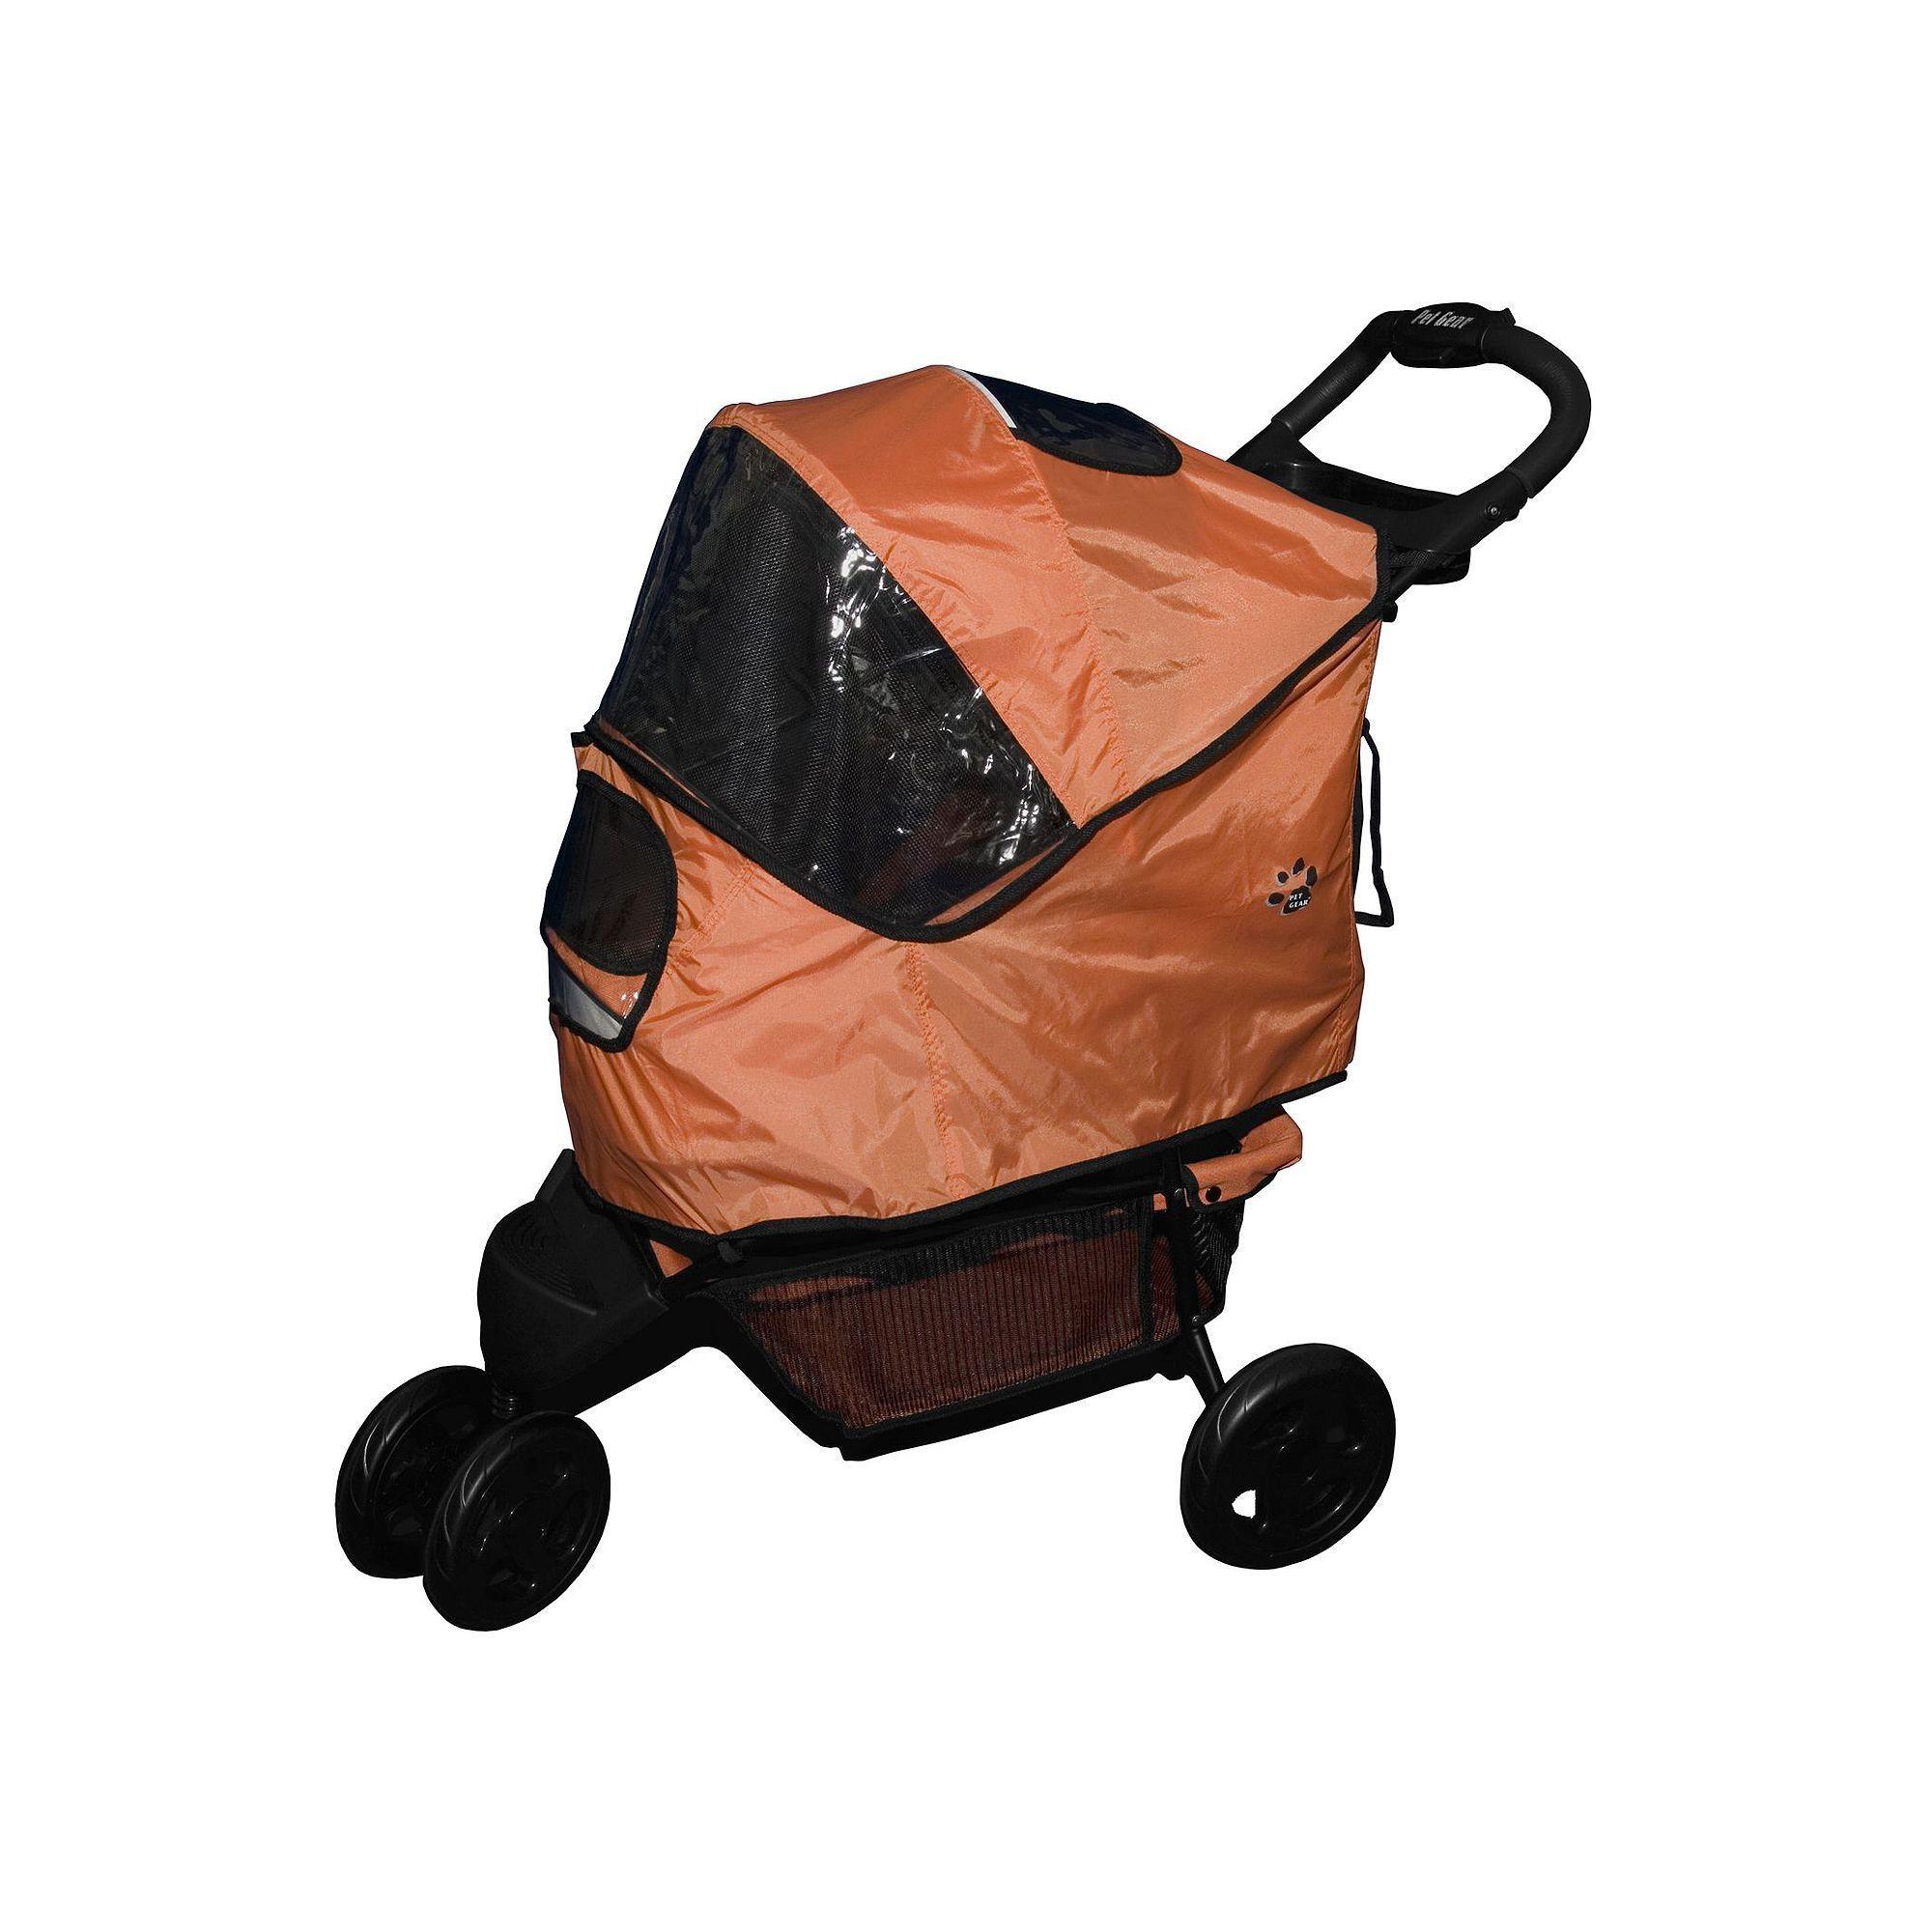 Pet Gear Sportster Stroller Cover Pet stroller, Pet gear